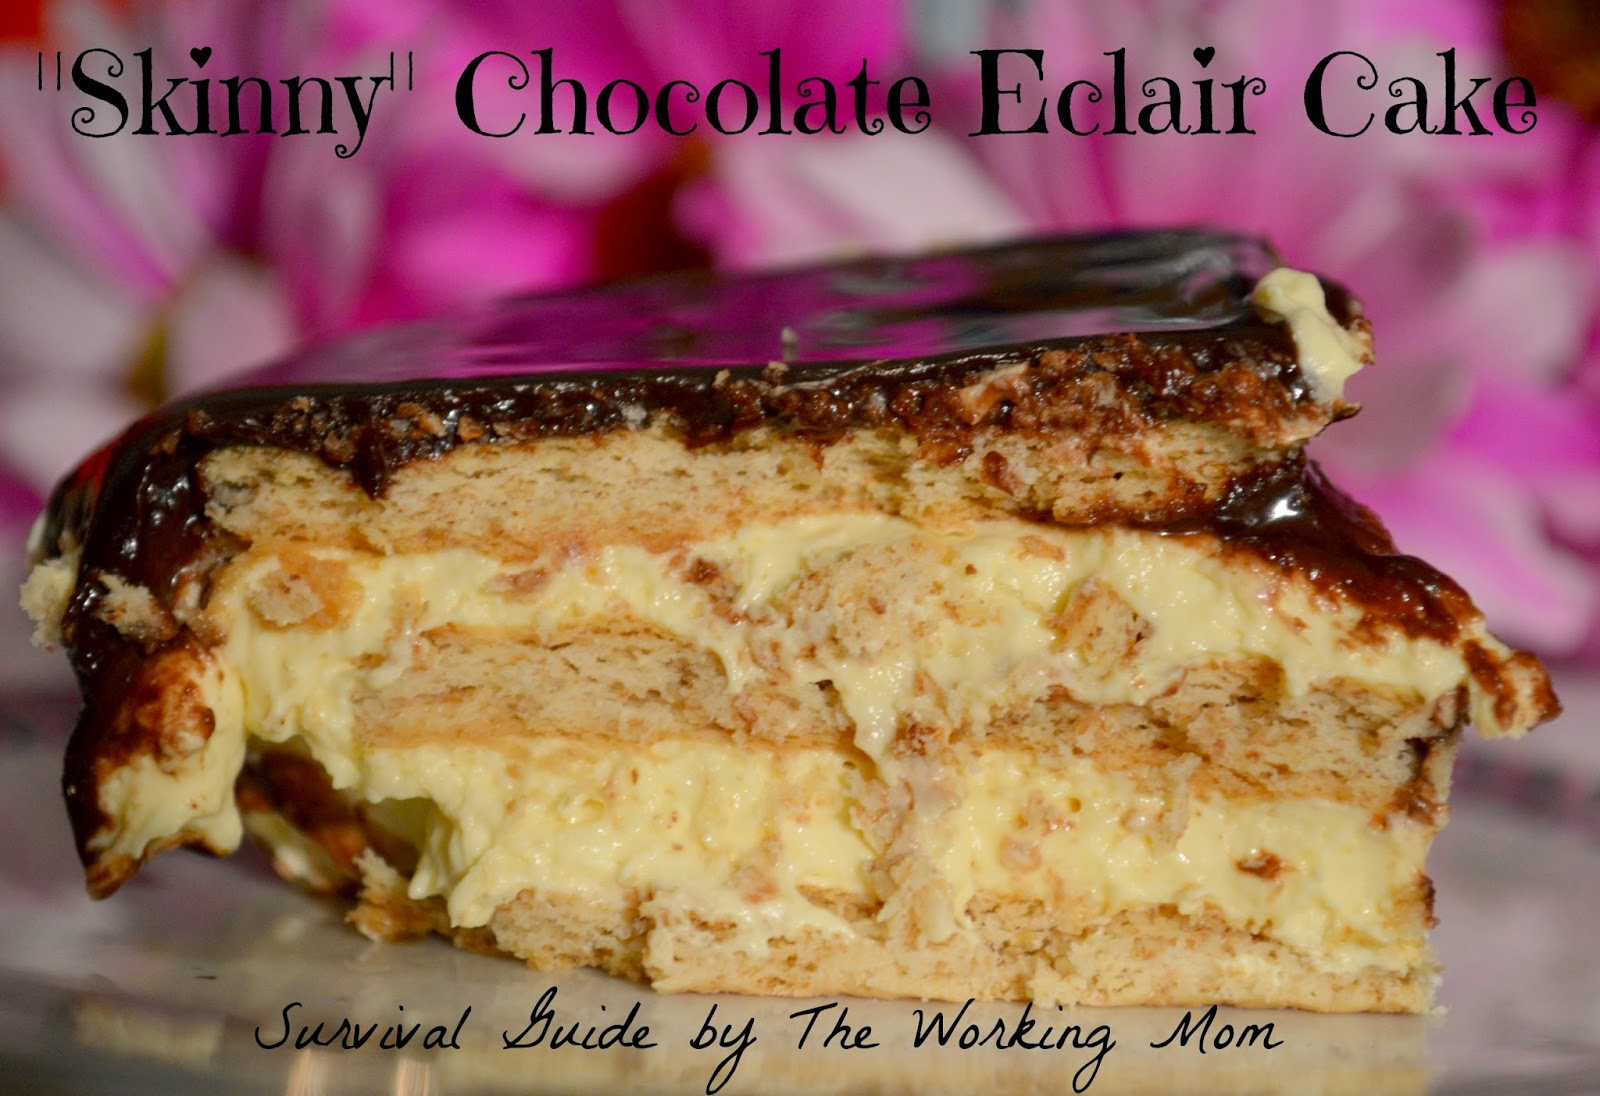 Chocolate Eclair Cake Recipe  Skinny Chocolate Eclair Cake Recipe Guide For Moms